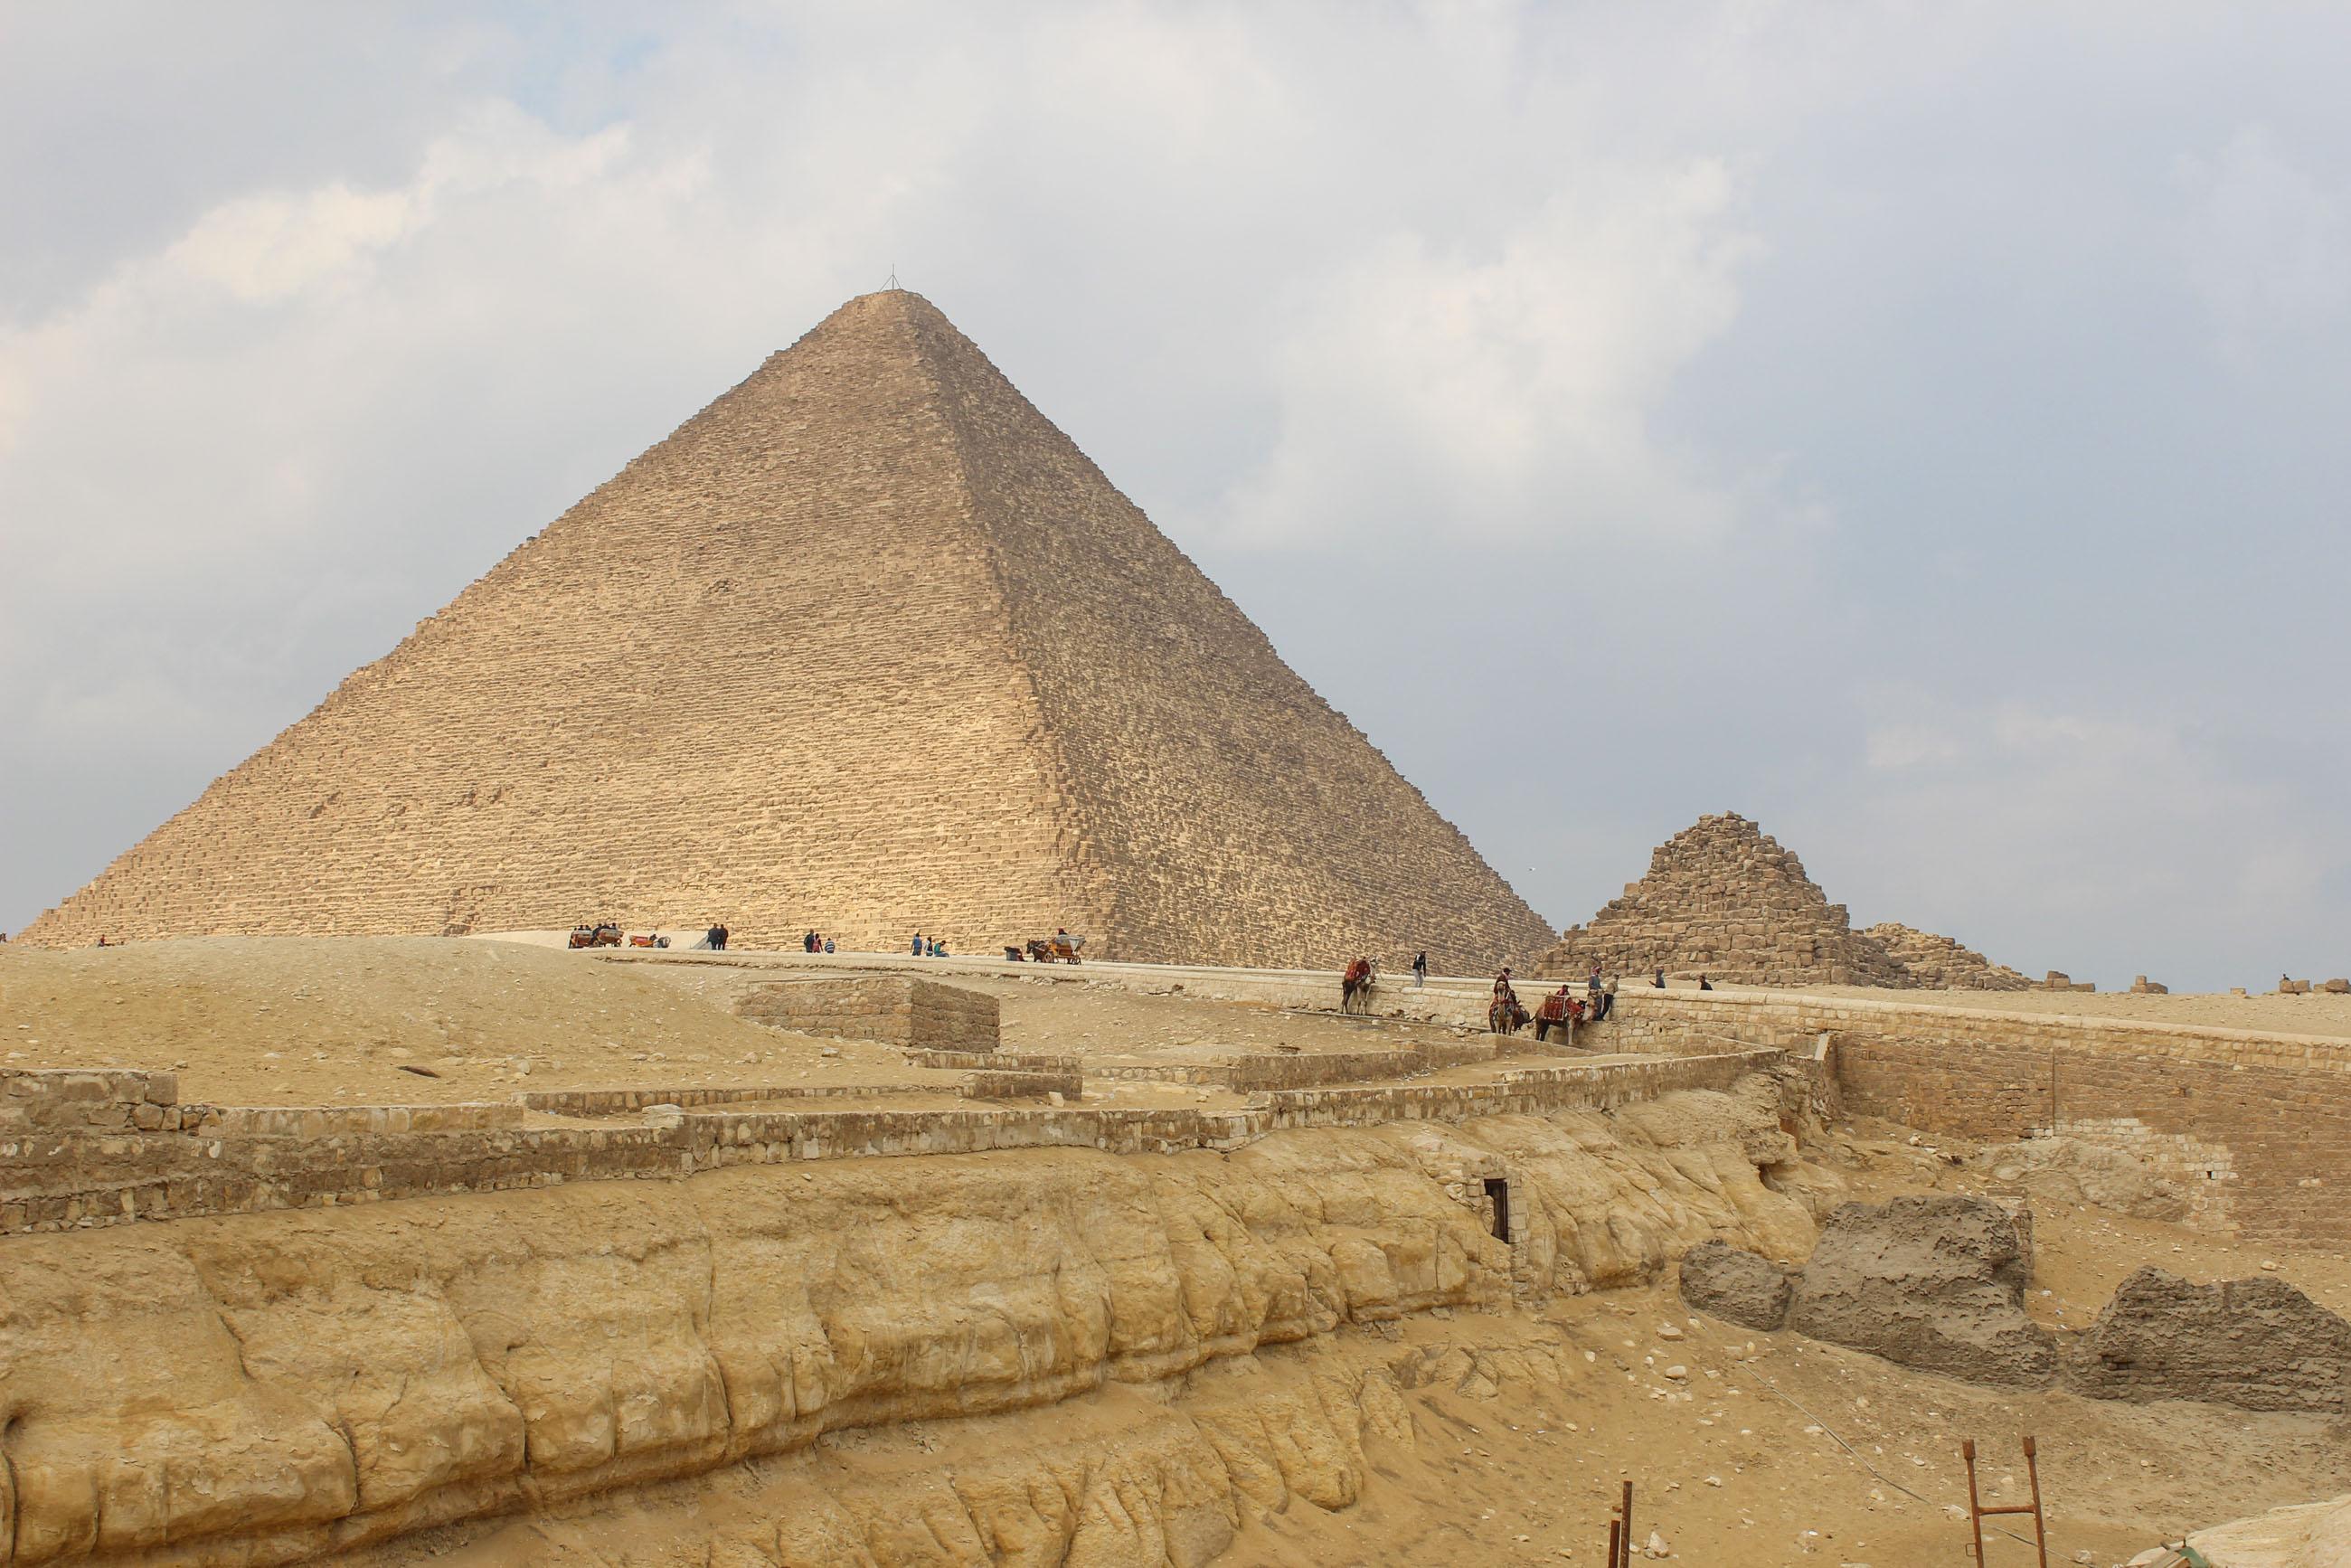 https://bubo.sk/uploads/galleries/18745/kristinabulvasova_egypt_pyramidy_img_6101.jpg